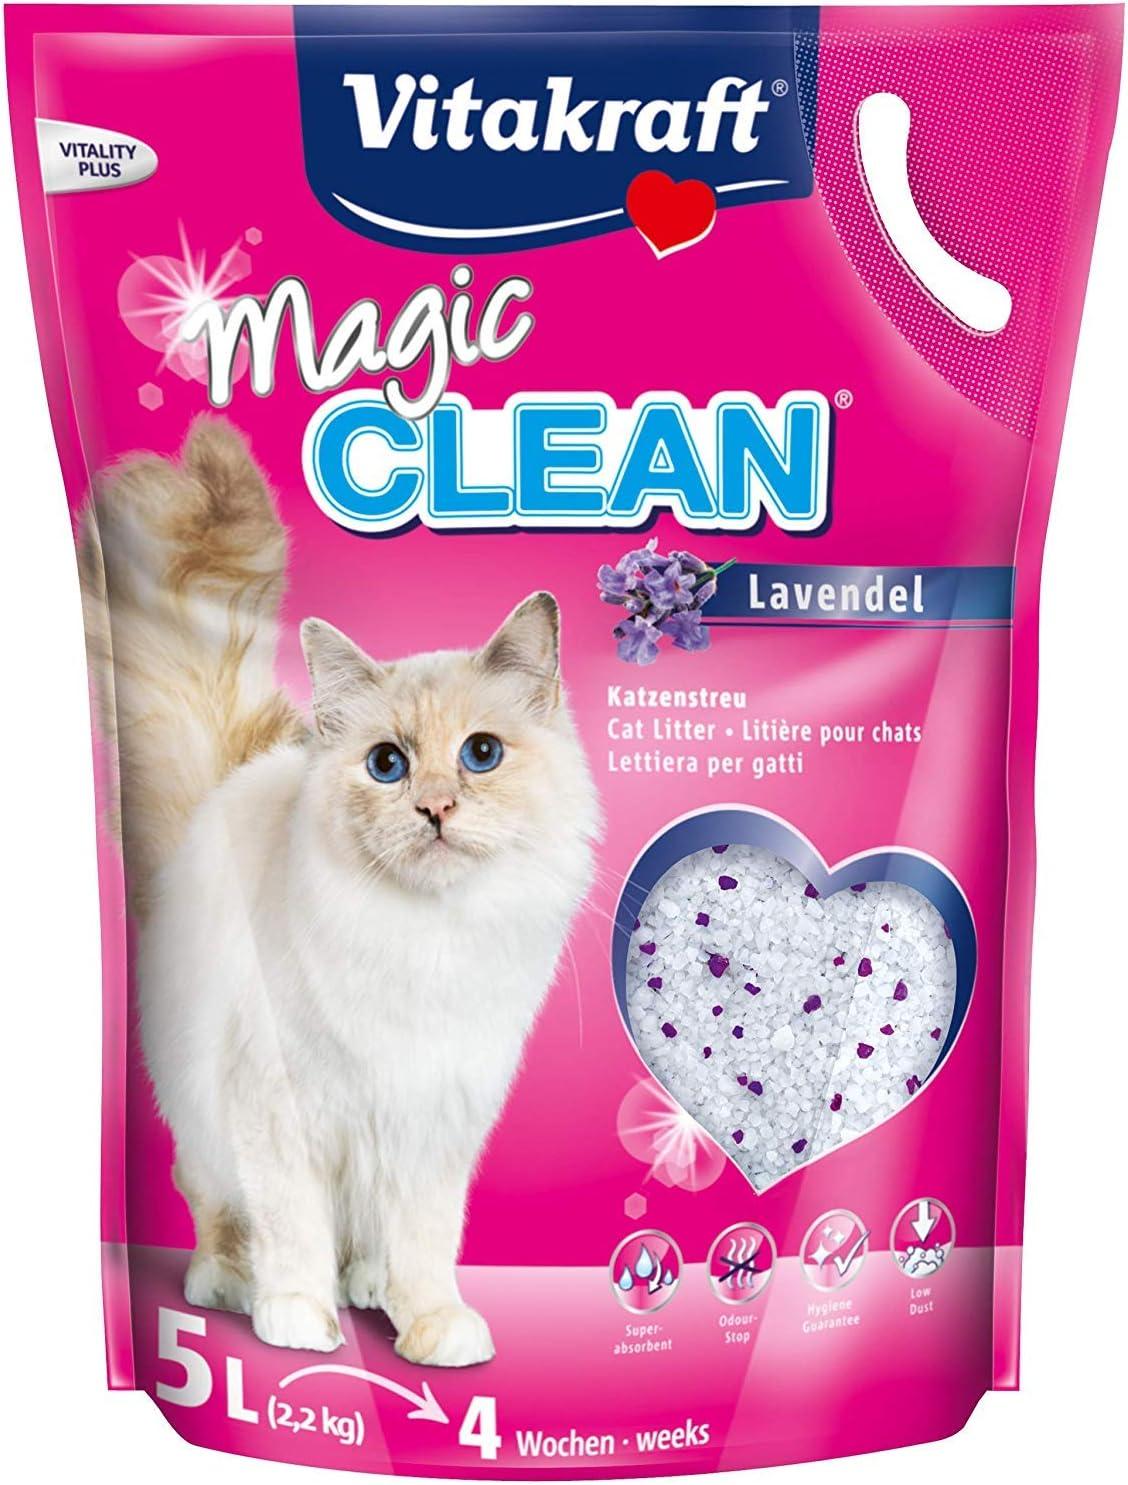 Magic Clean - Arena para Gatos, Lavanda, 5 l